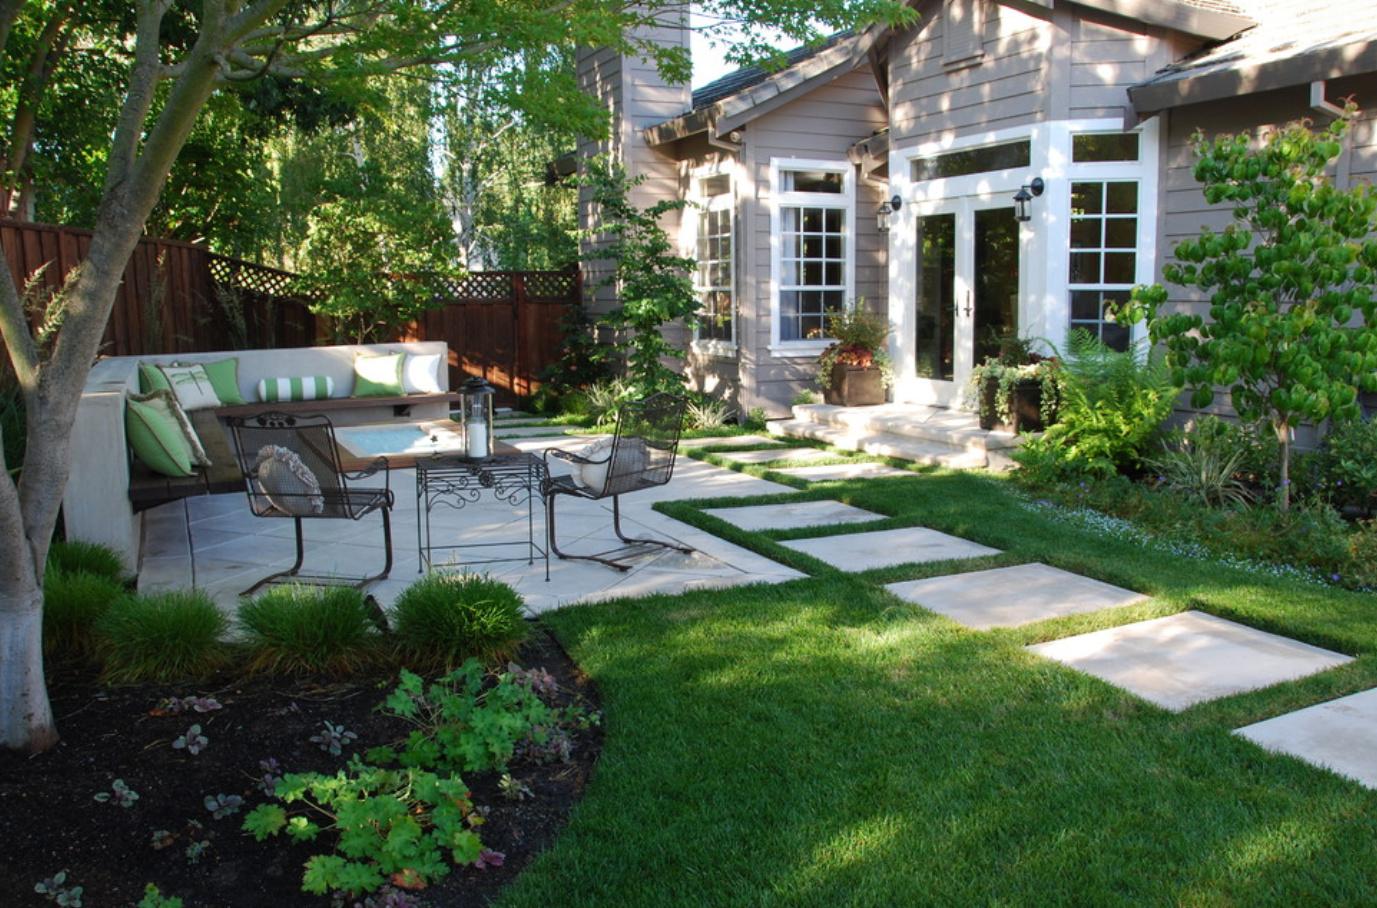 img 53e47d28d1b8e - Ландшафтный дизайн сада и огорода своими руками